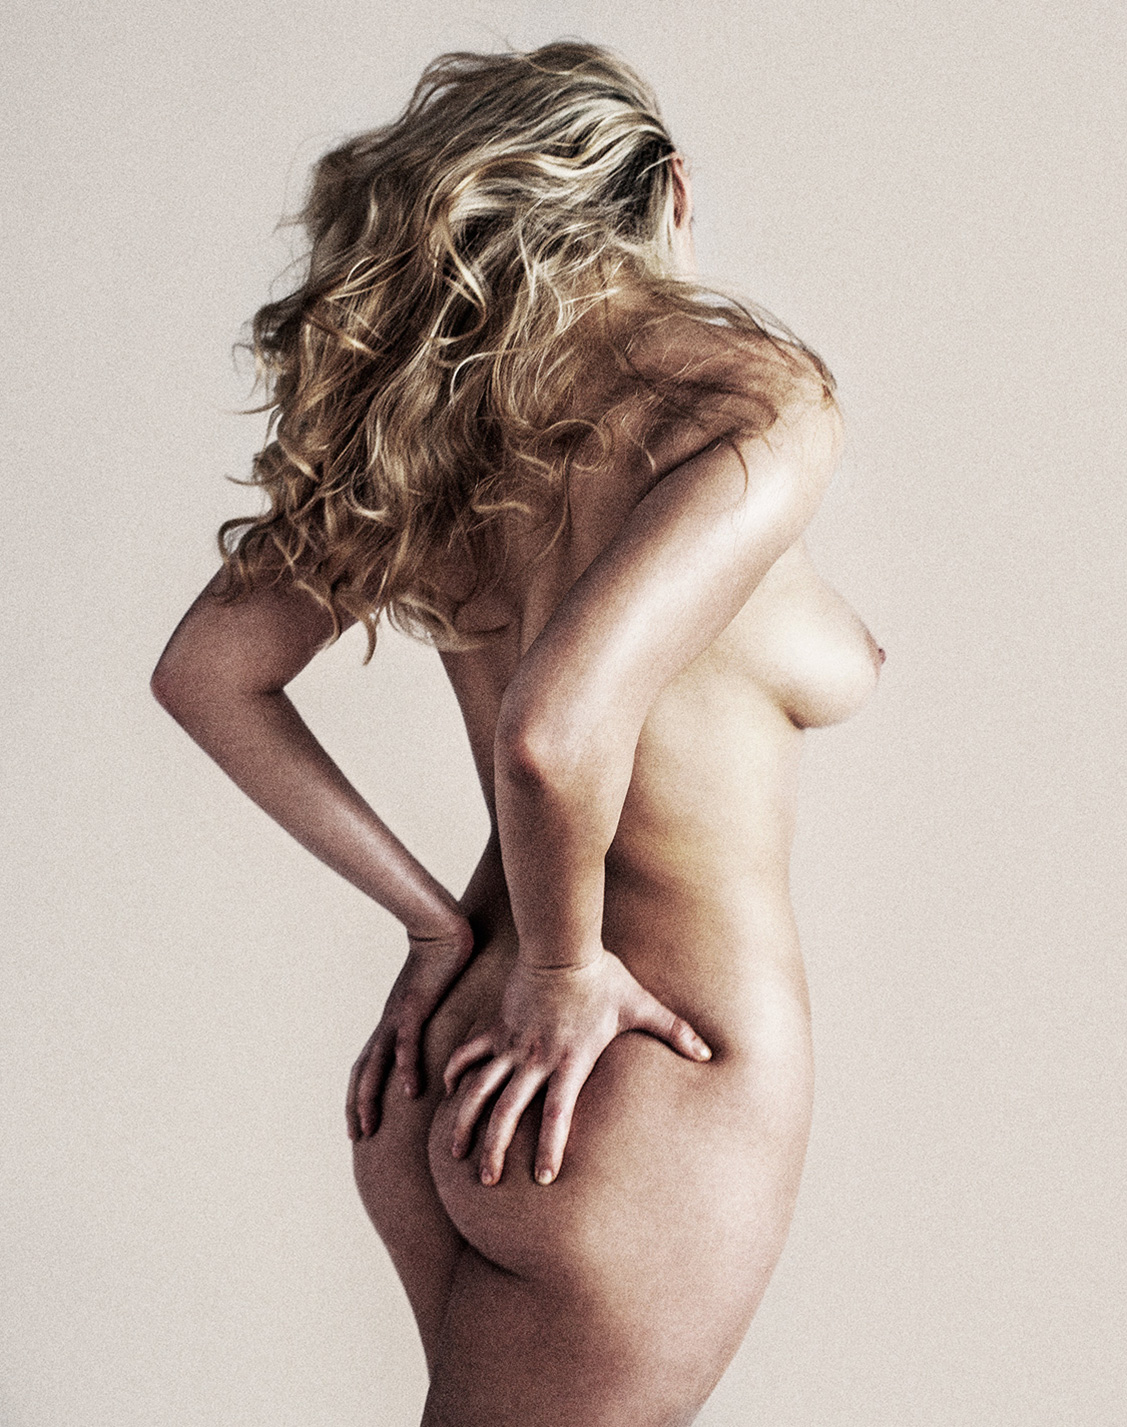 Кристина Казакова / Khrystyna Kazakova nude by Cory Vanderploeg - Yume Magazine